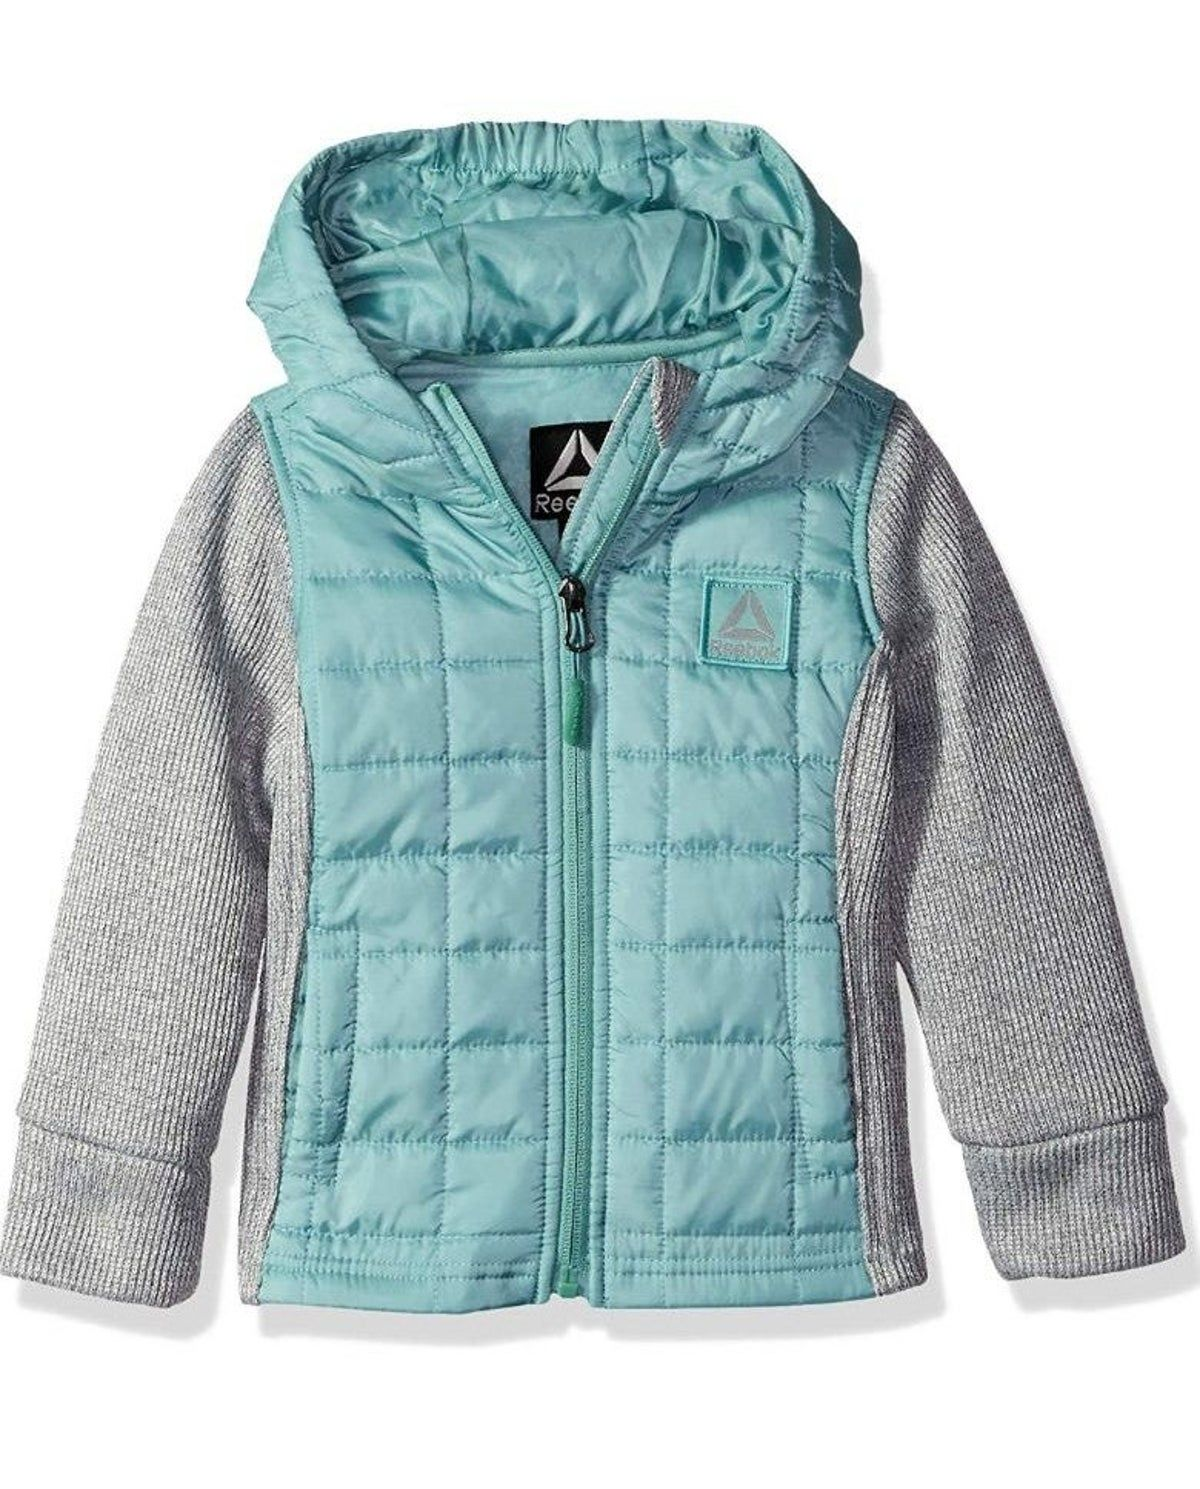 Reebok Girls Active Spyder Fleece Bubbl Outerwear Jackets Jackets Girls Vest [ 1489 x 1200 Pixel ]